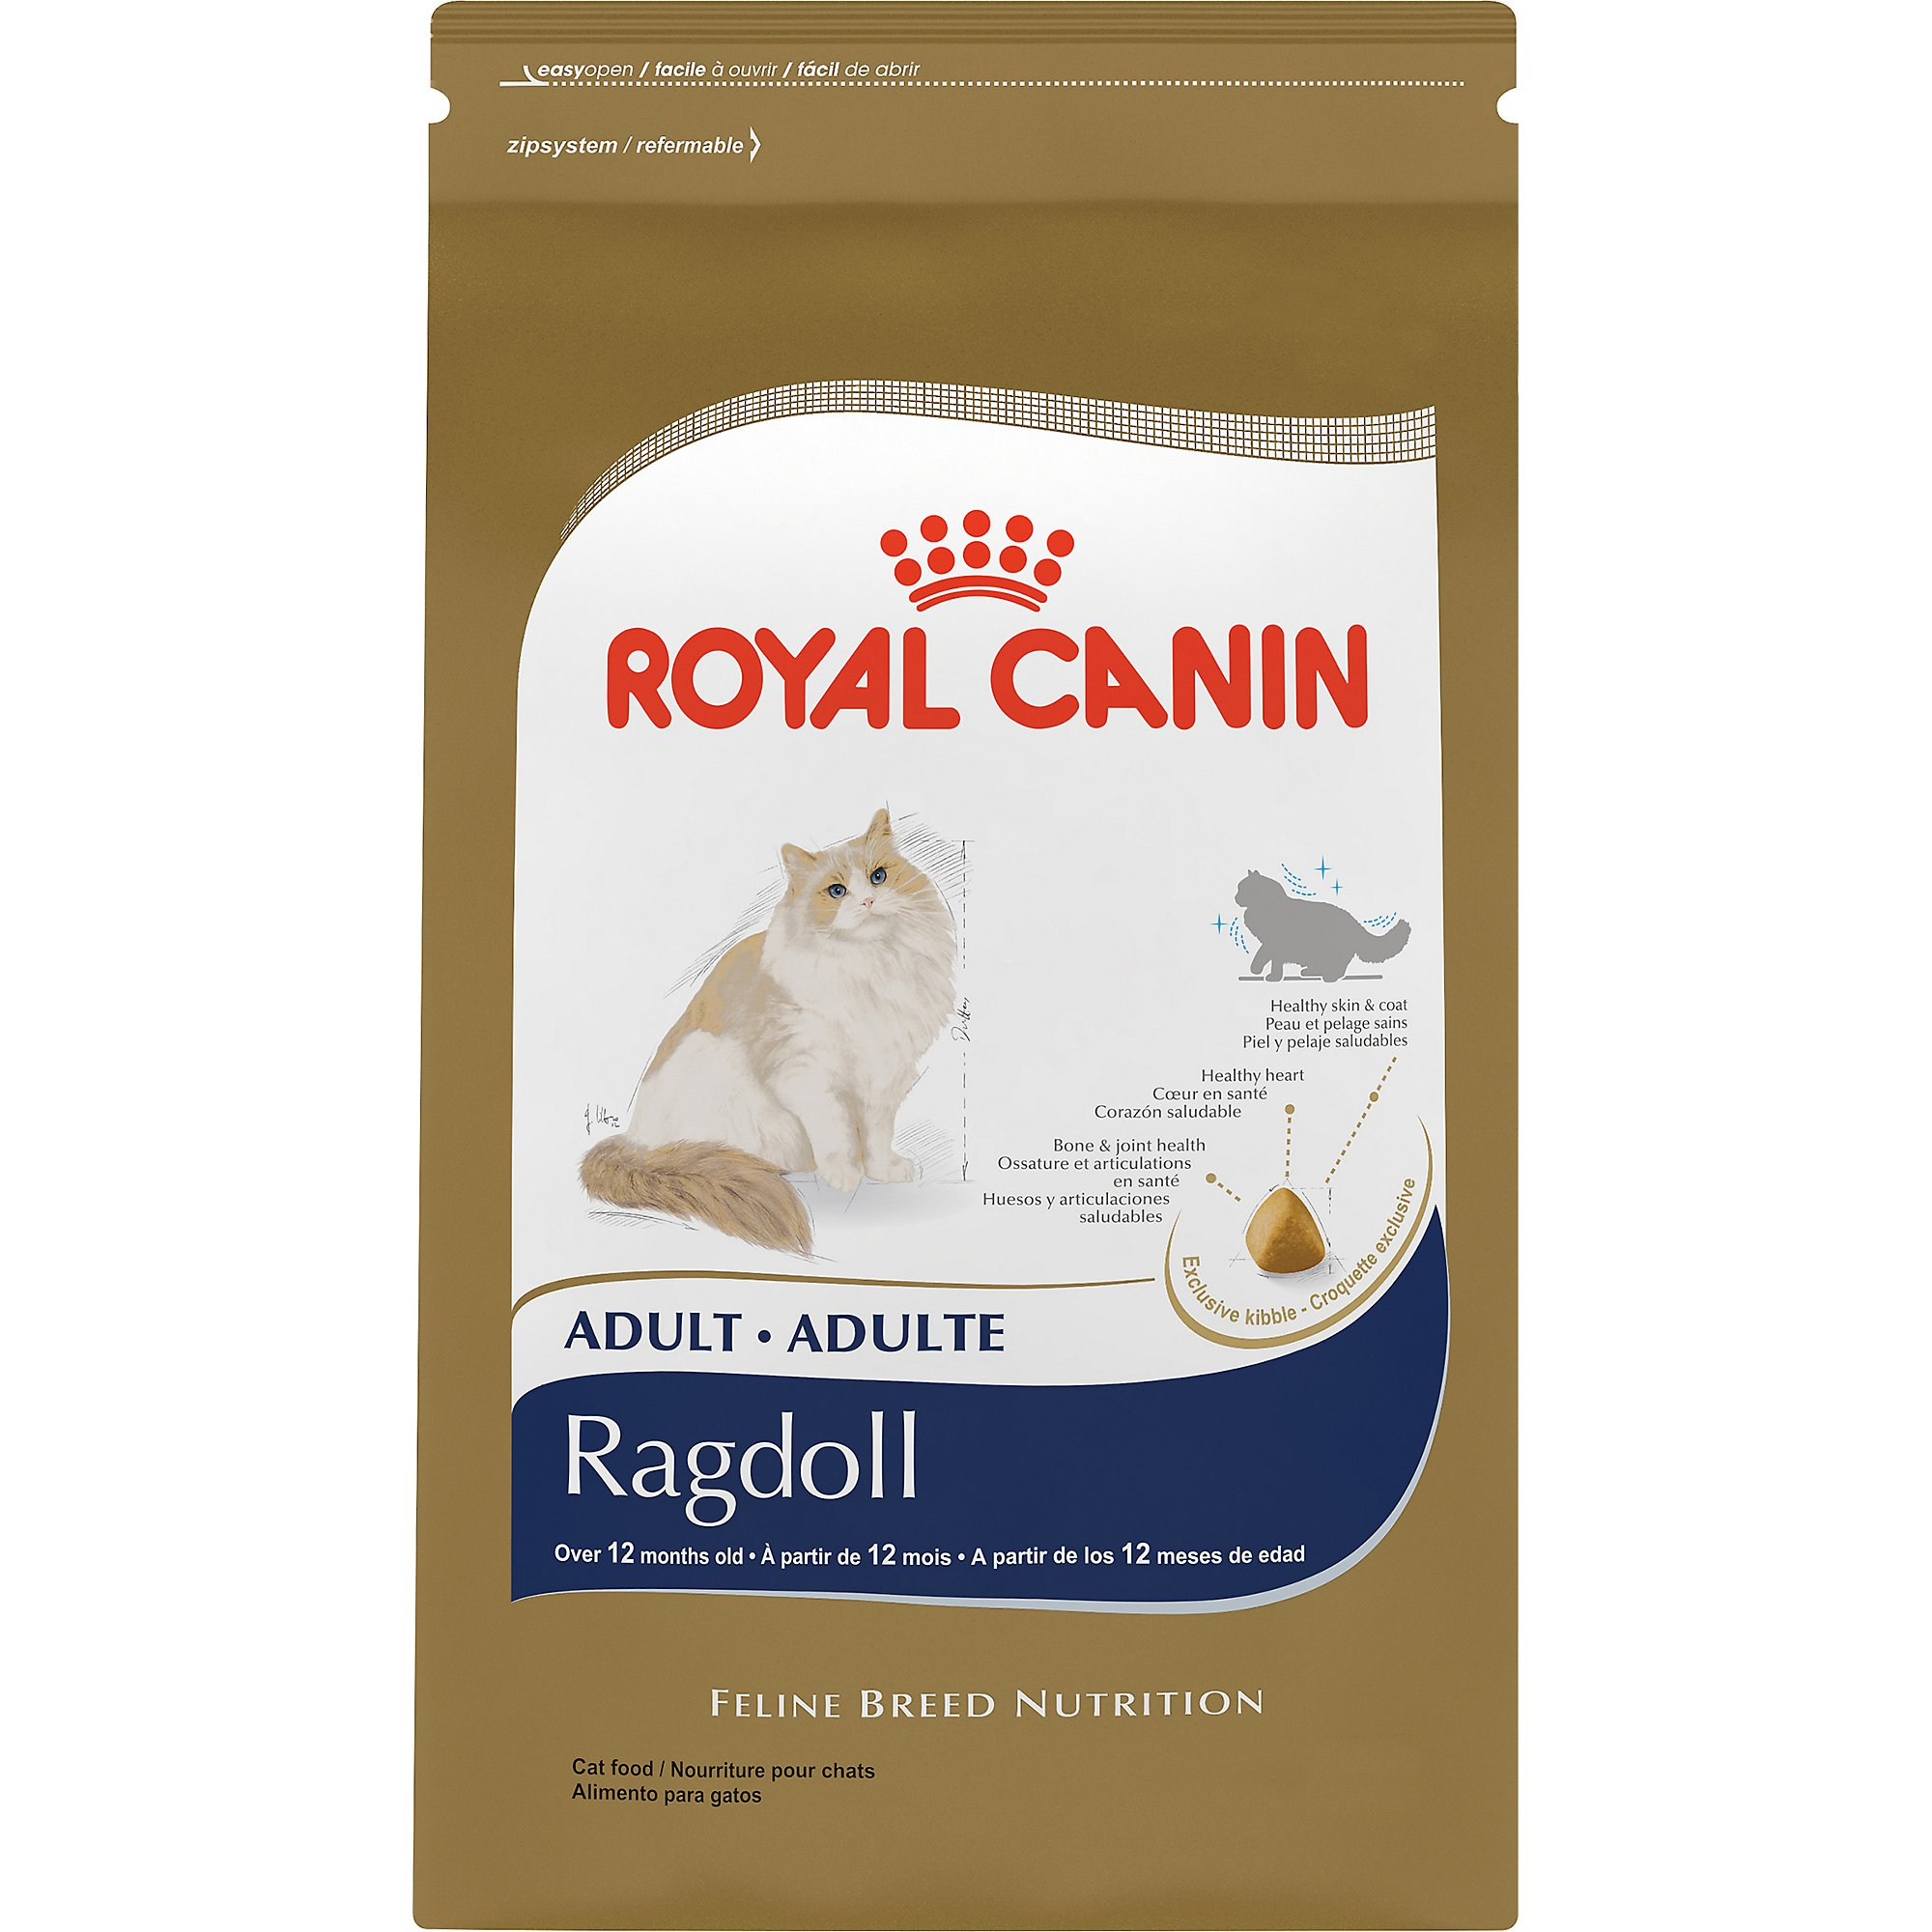 Royal Canin Ragdoll Cat Food